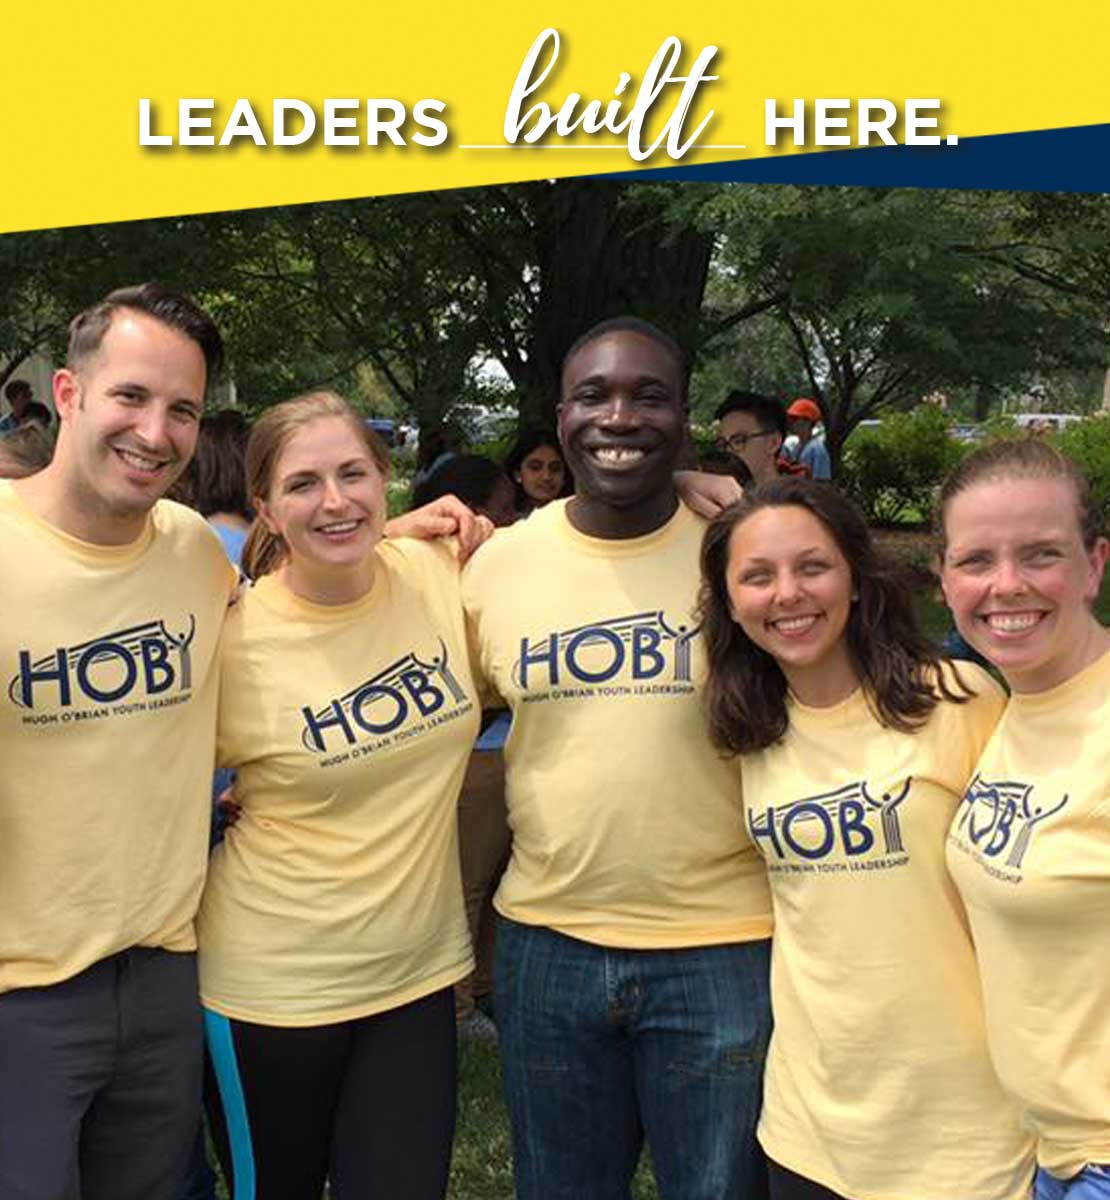 Hugh O'Brian Youth Leadership